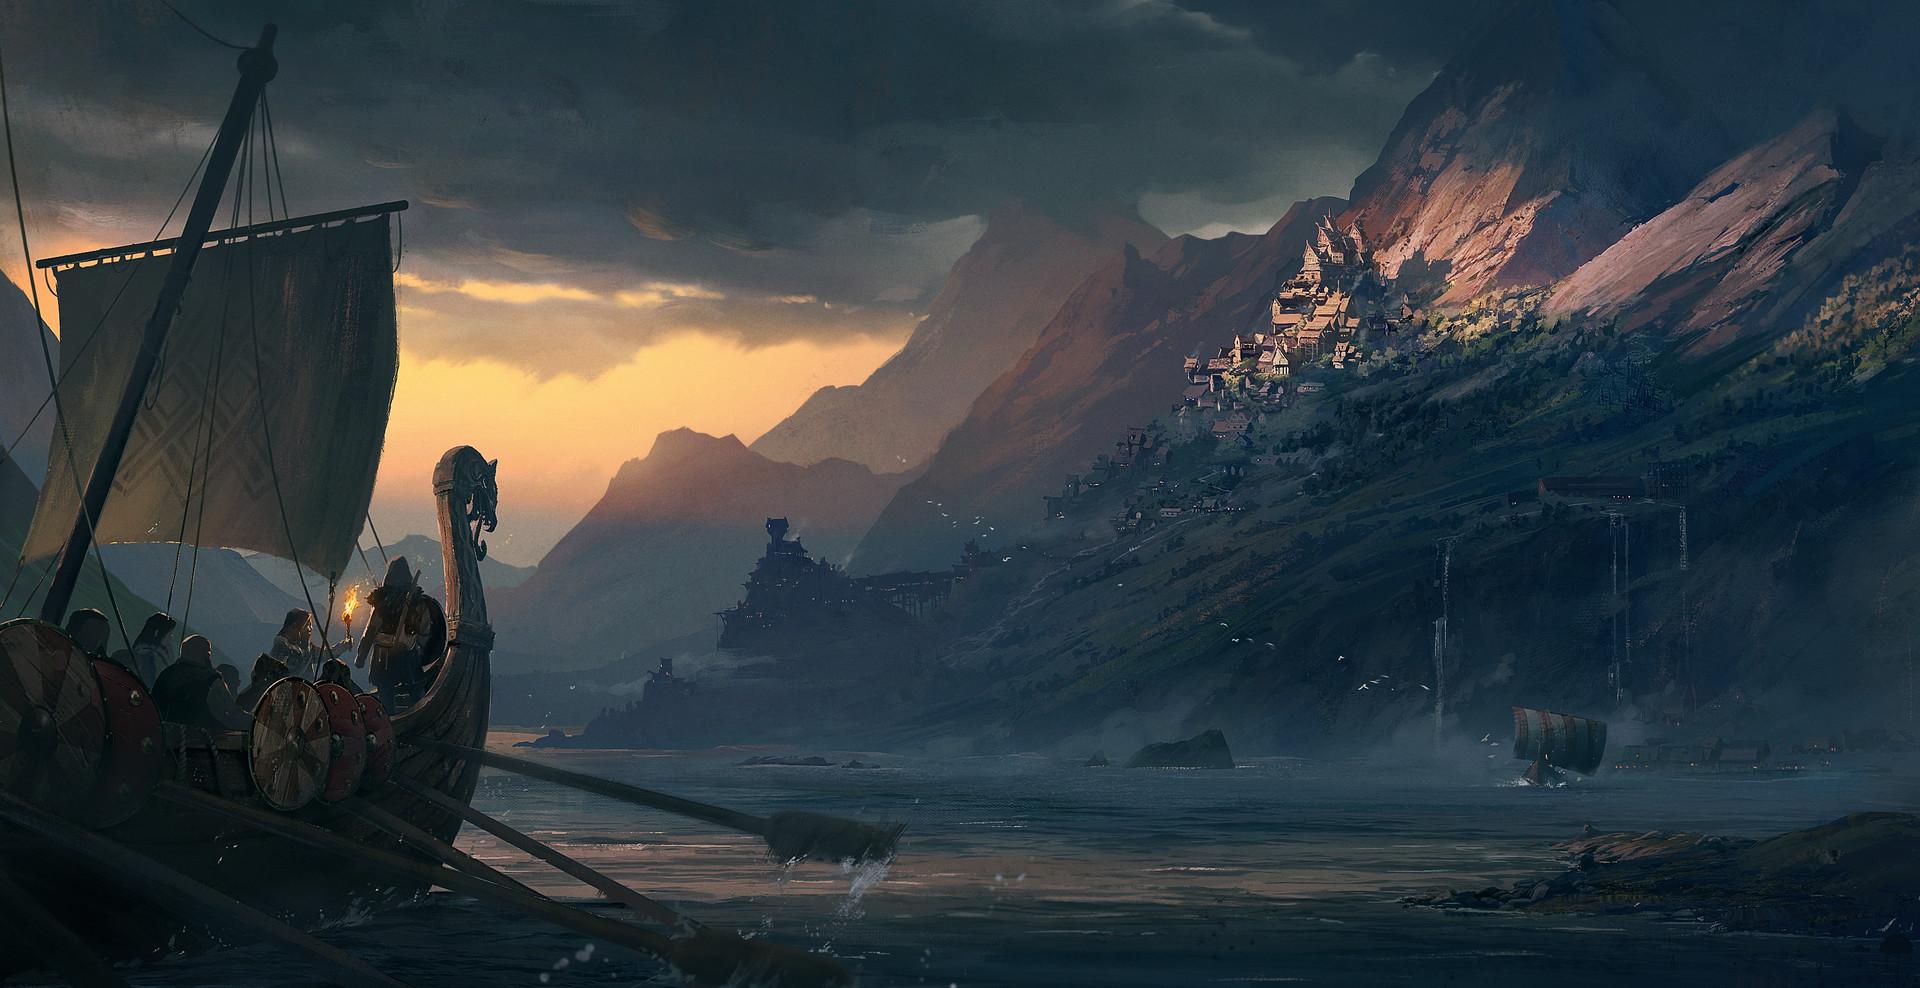 Games Inbox: Assassin's Creed Vikings, Zelda VR surprise, and BAFTA award reactions